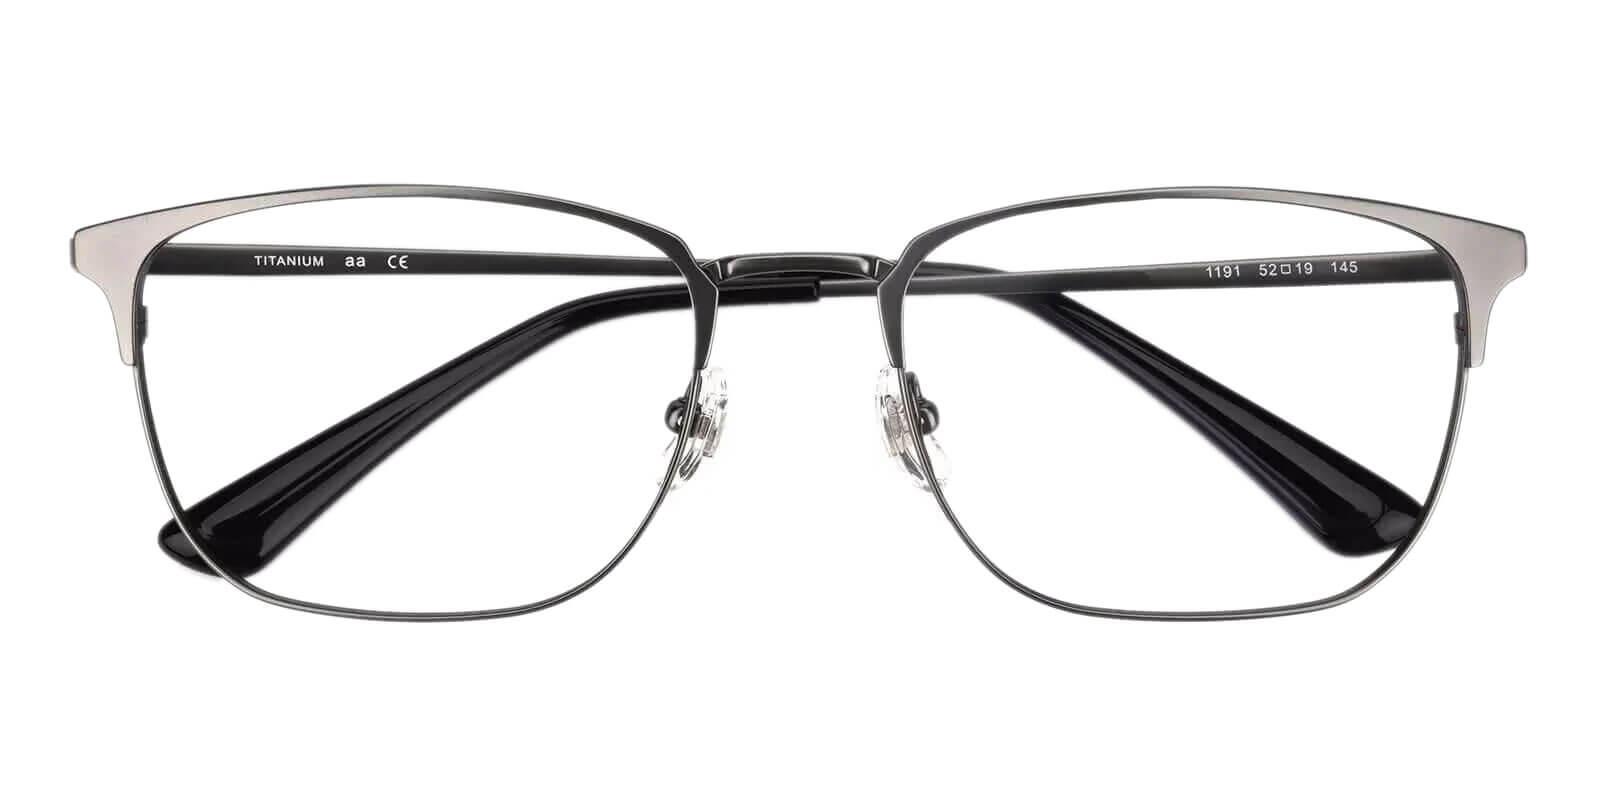 Nathan Gun Titanium Eyeglasses , Lightweight , NosePads Frames from ABBE Glasses